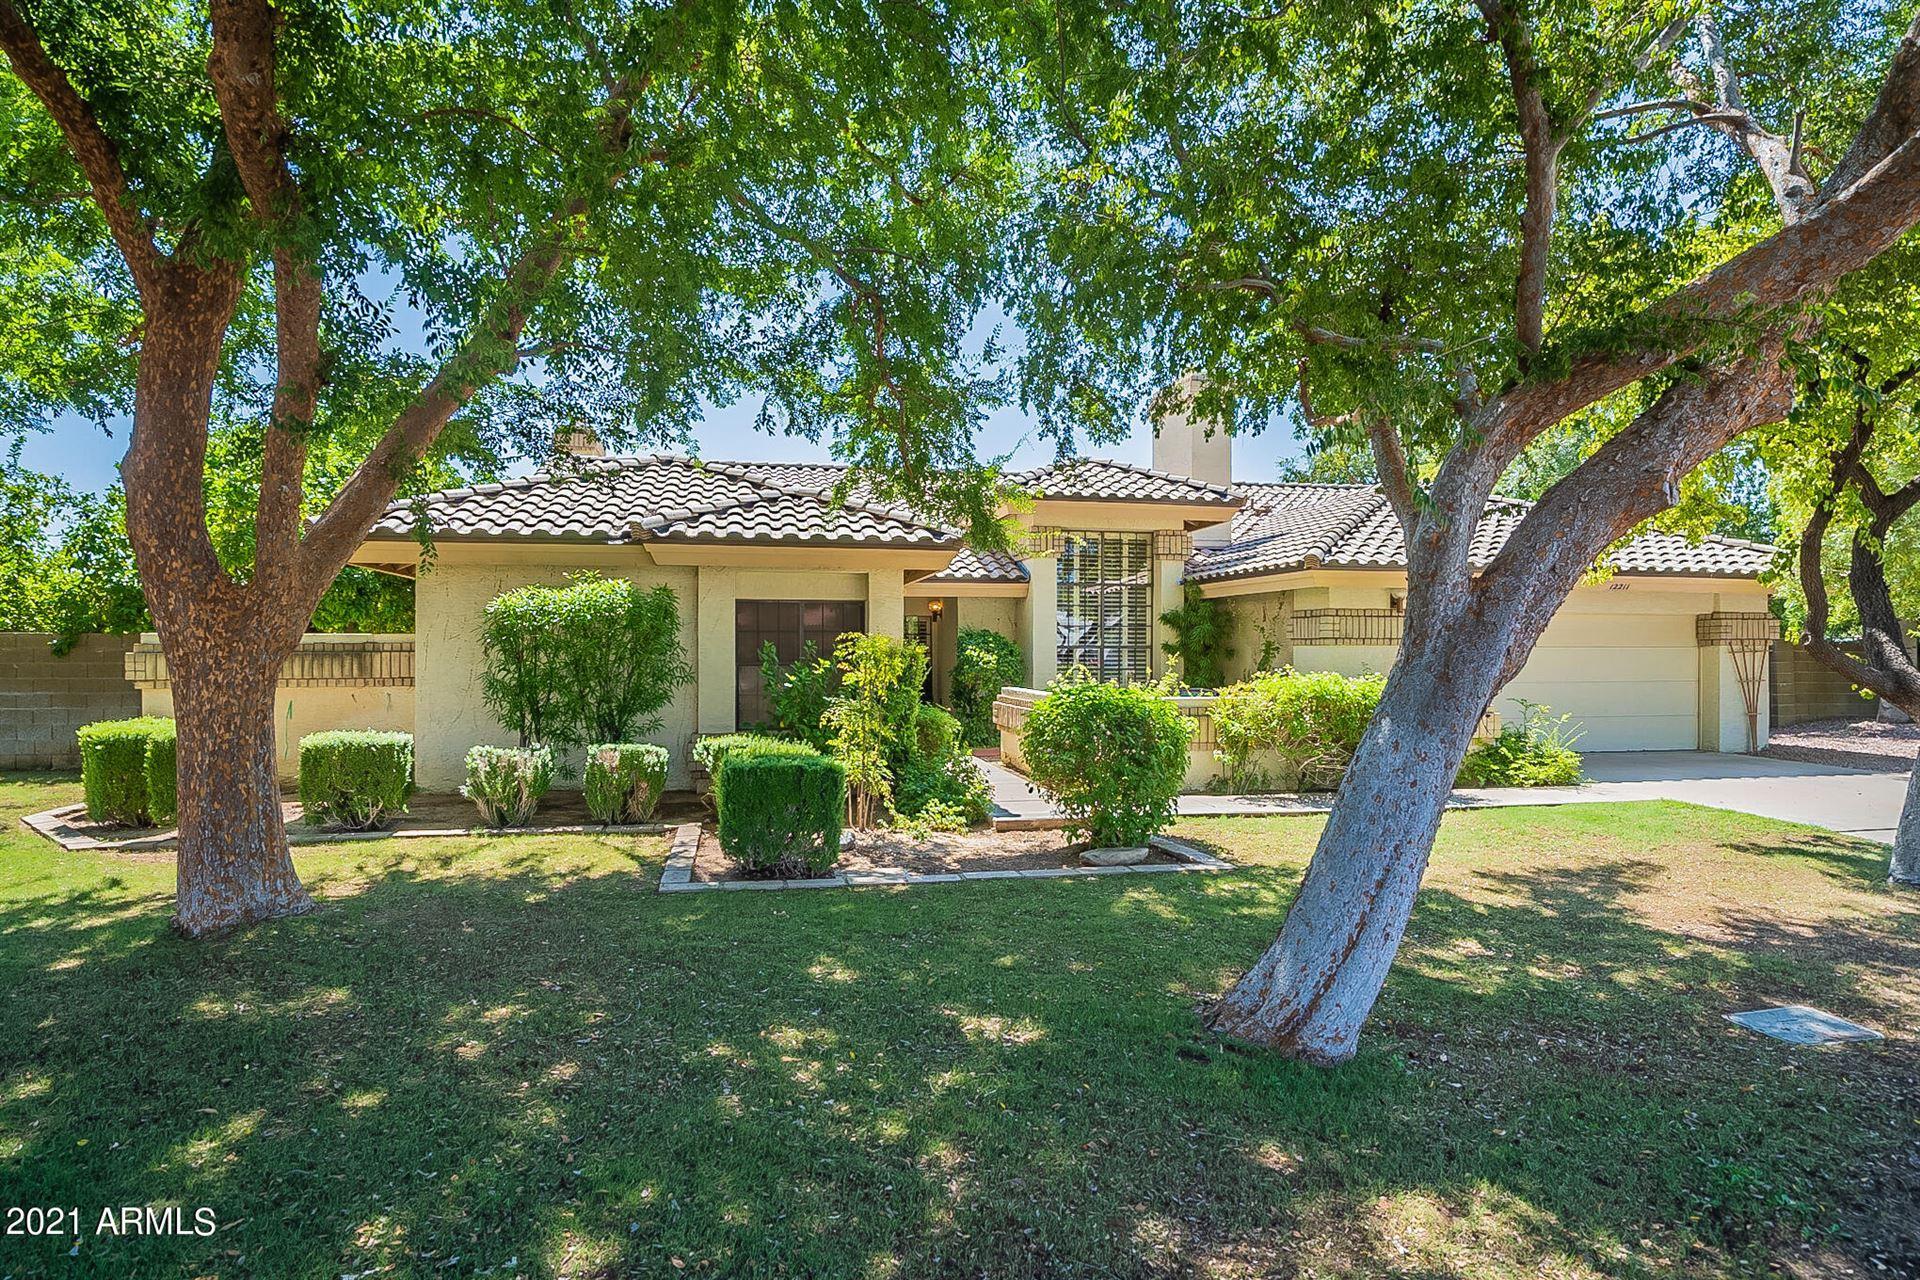 12211 N 74TH Street, Scottsdale, AZ 85260 - MLS#: 6283520